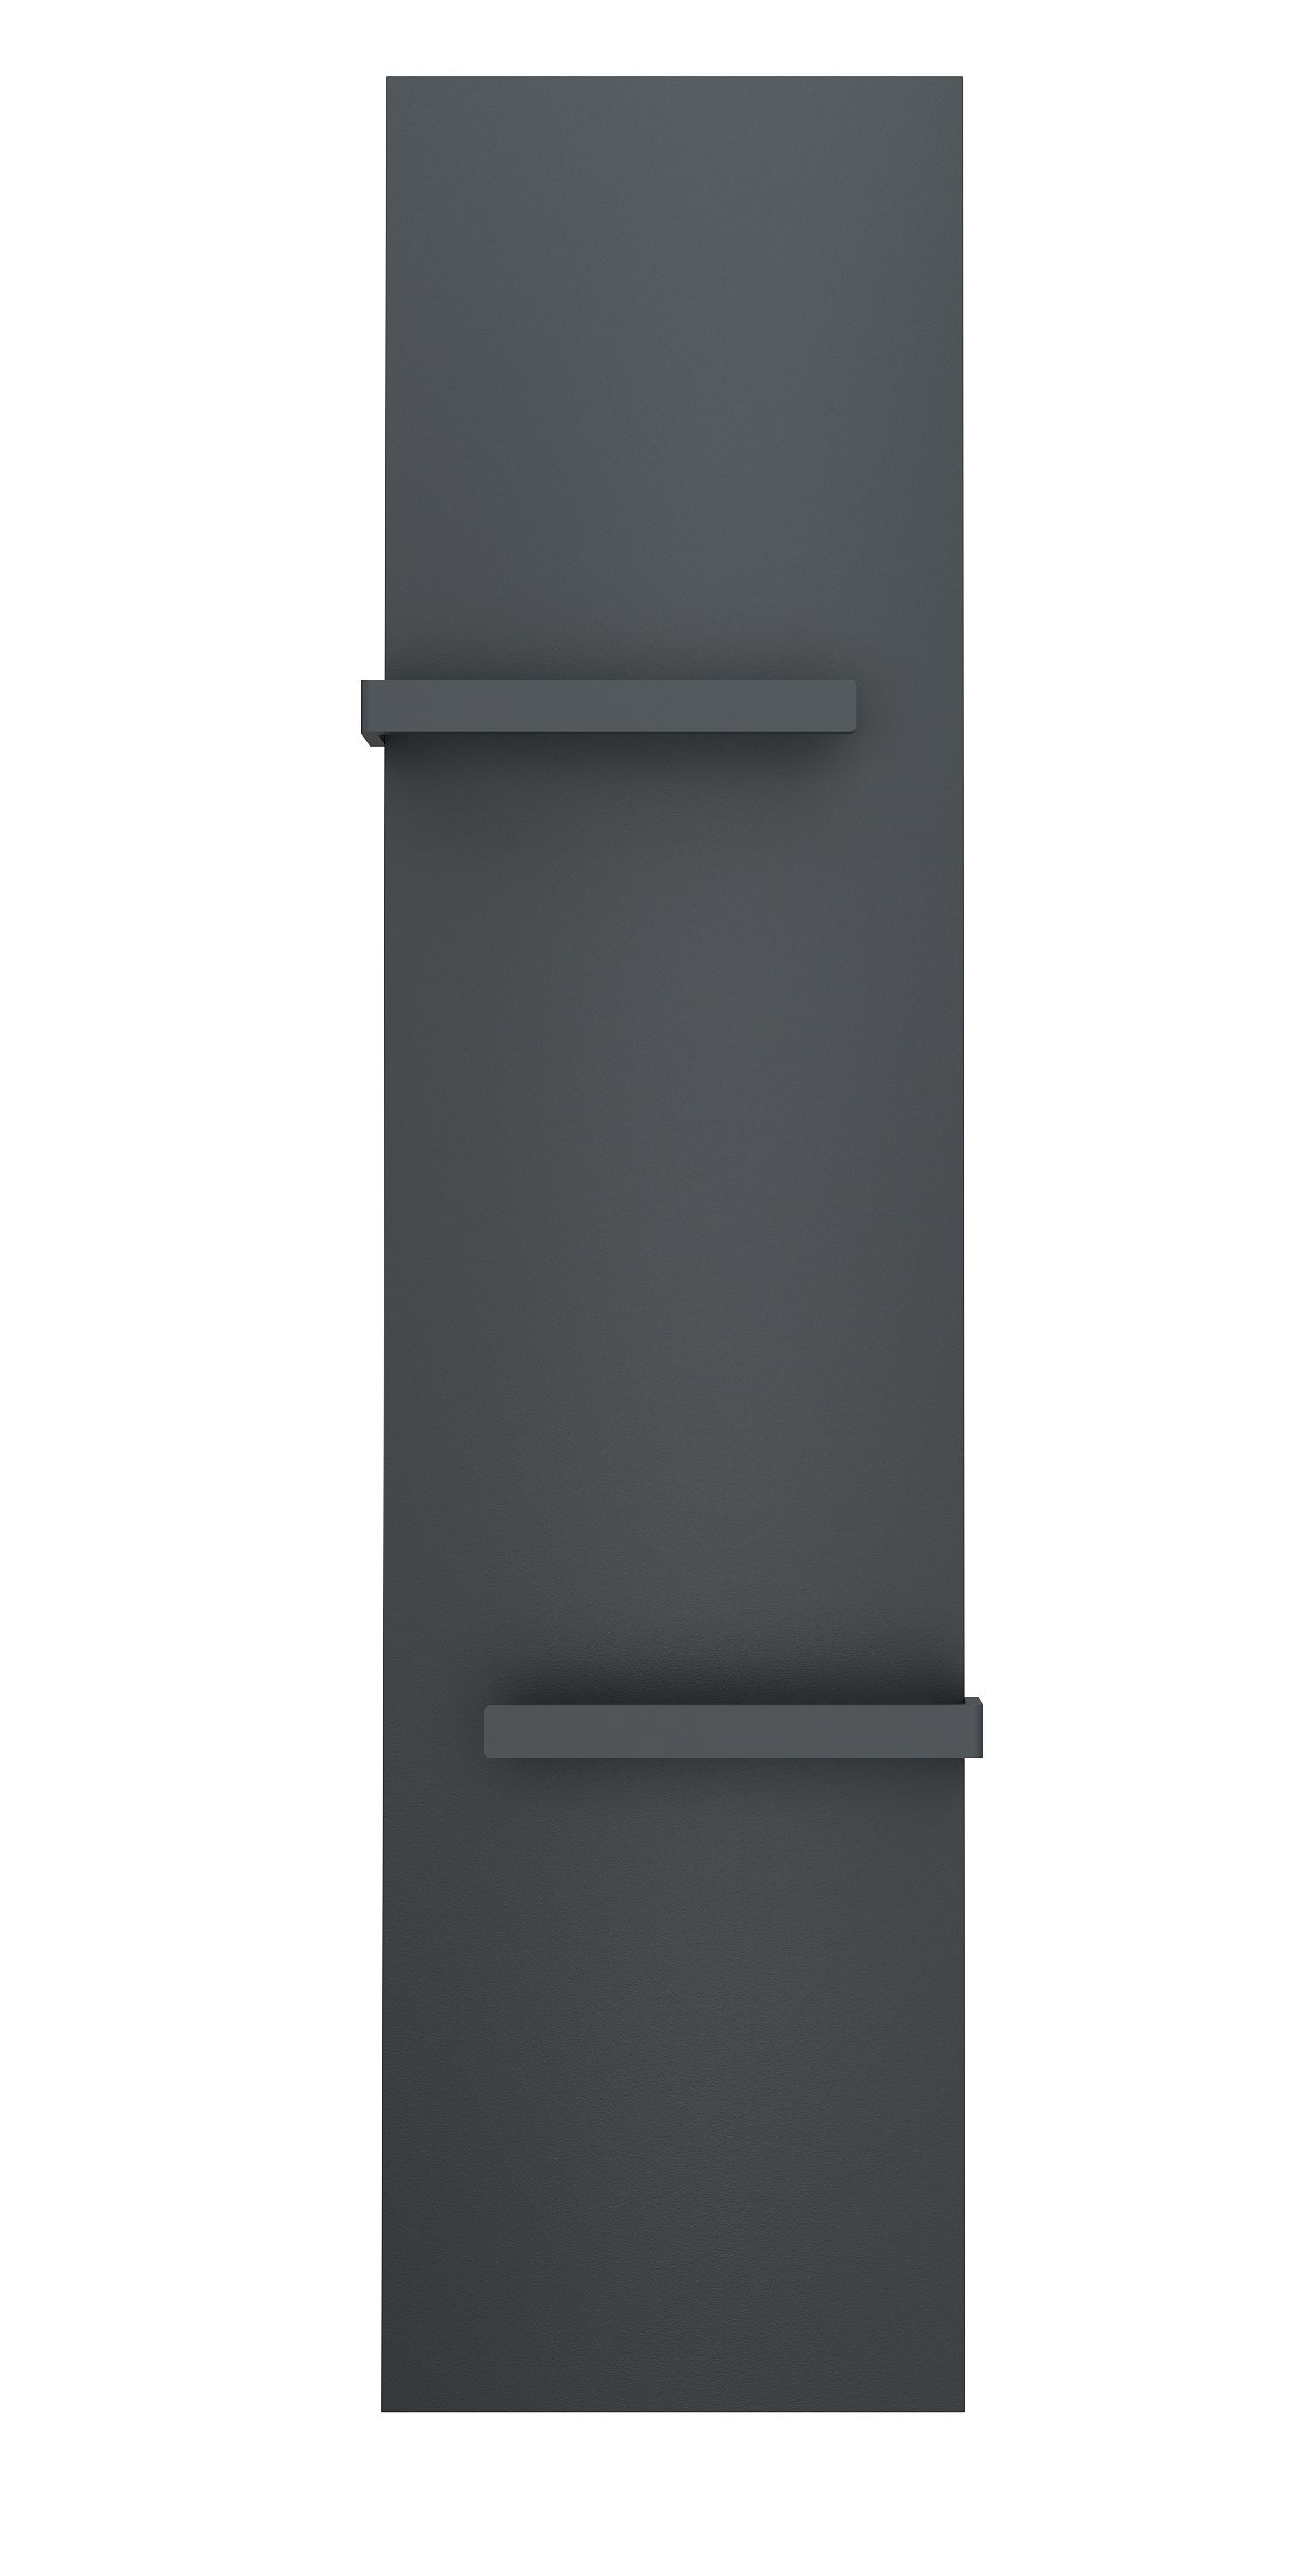 Badheizkörper ALWAR in 140 x 45 cm (Mittelanschluss, grau)